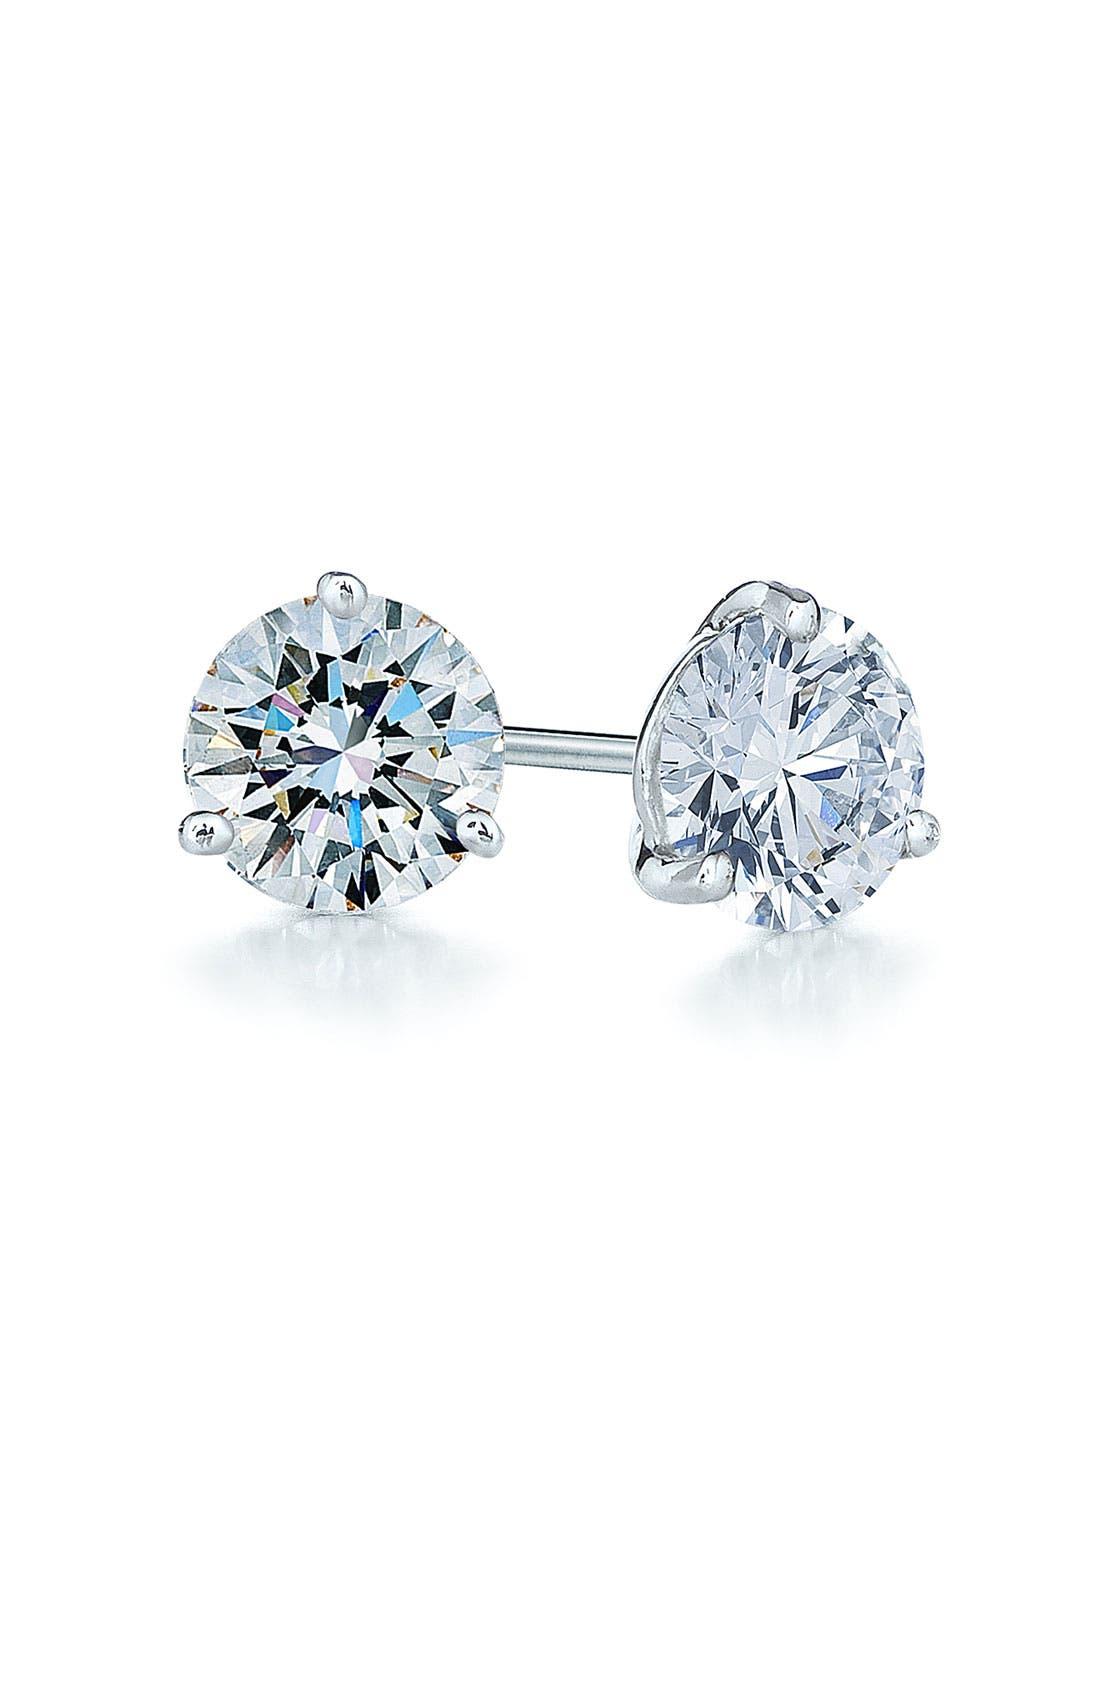 1ct tw Diamond & Platinum Stud Earrings,                             Main thumbnail 1, color,                             PLATINUM